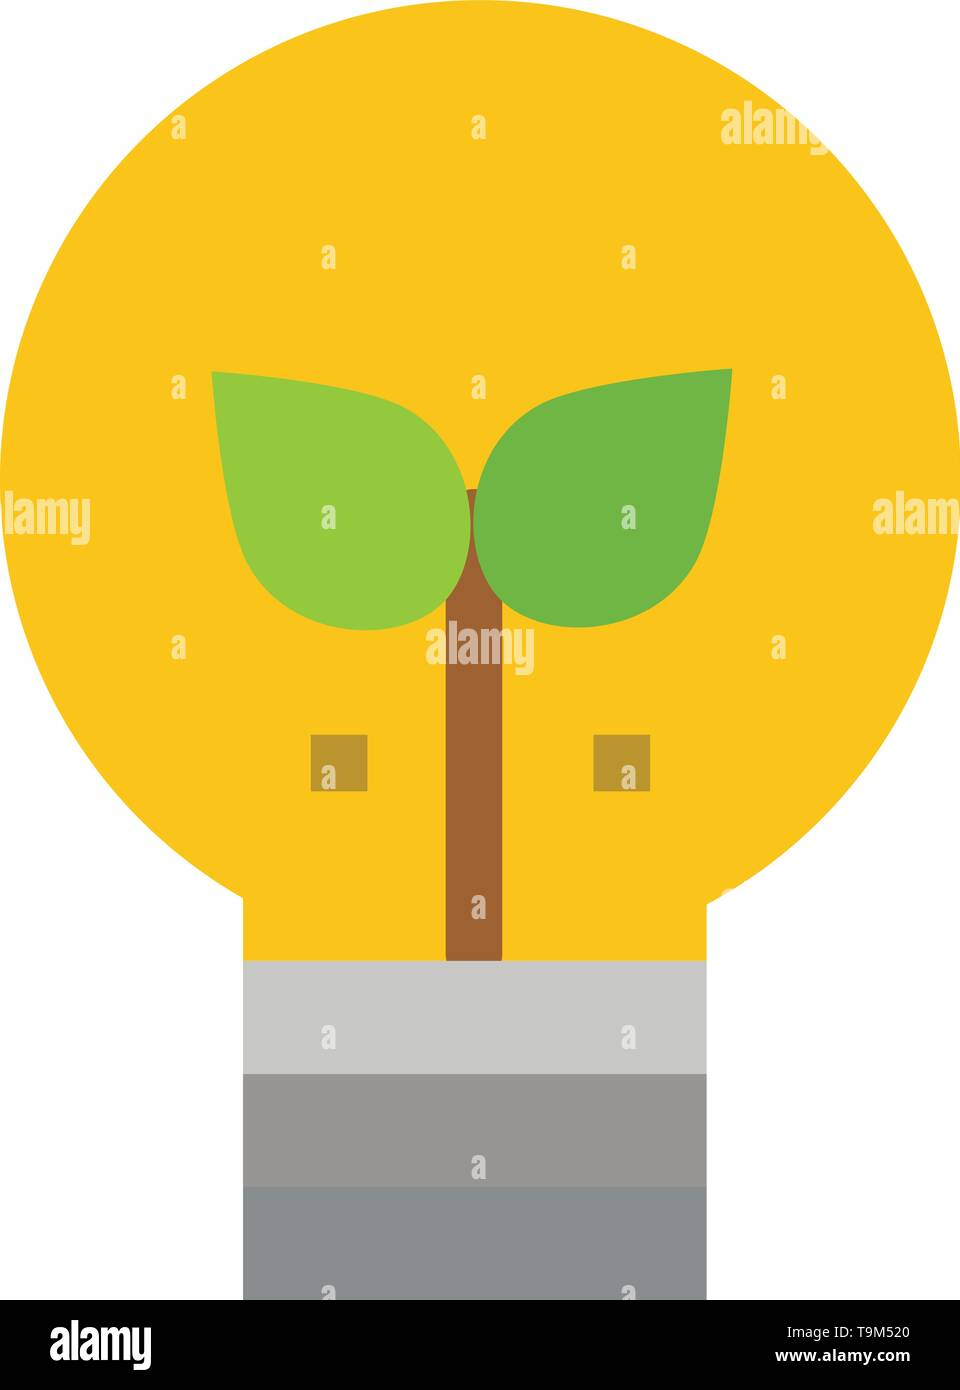 Eco, Idee, lampe, Licht flach Farbe Symbol. Vektor icon banner Vorlage Stockbild